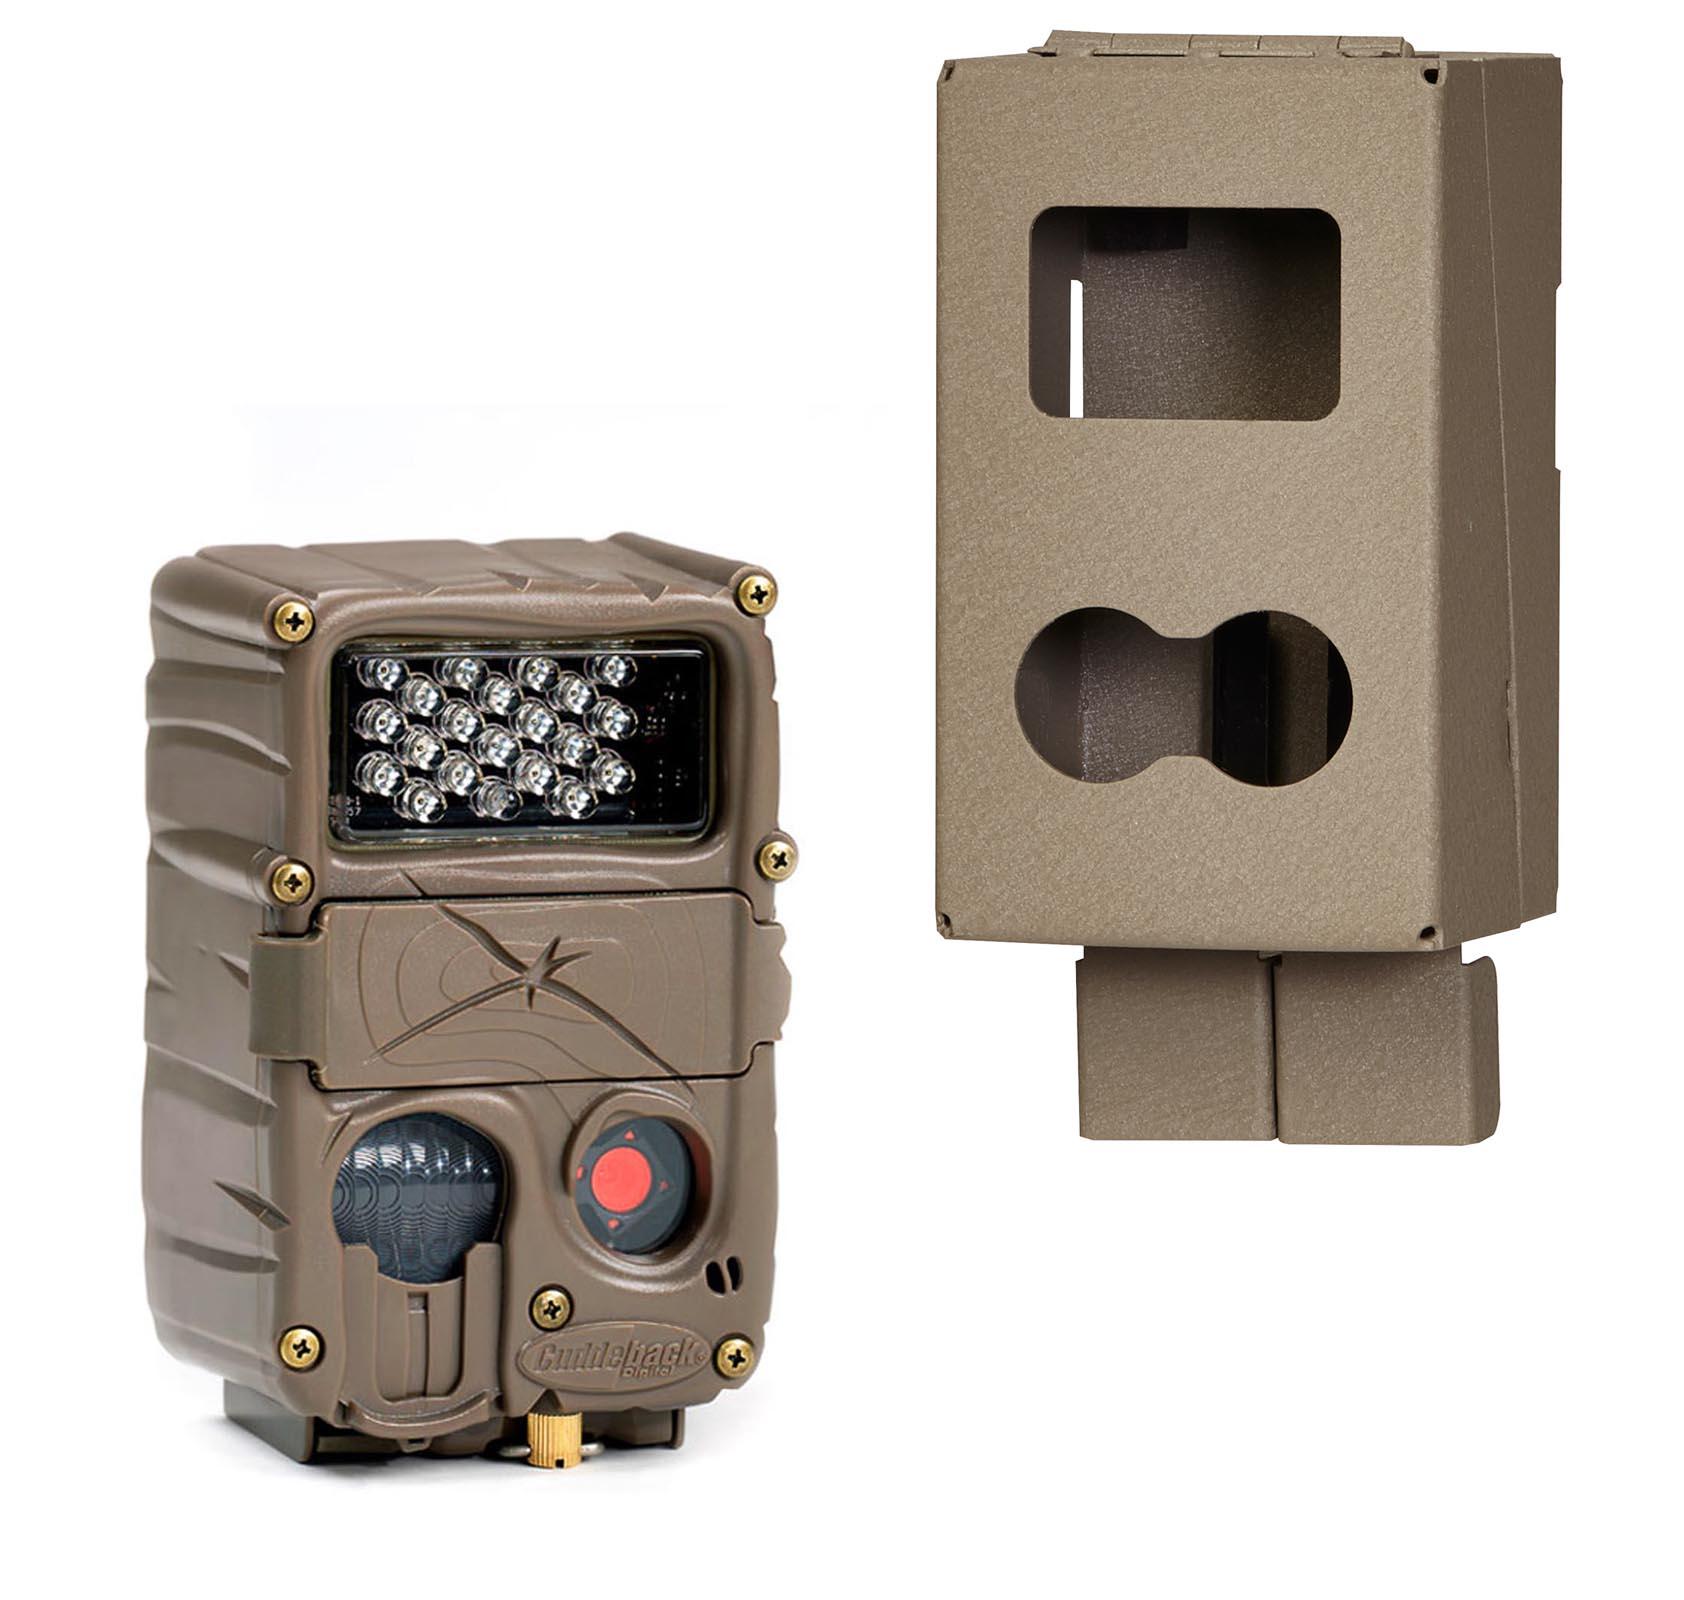 Cuddeback Model E2 Long Range IR Infrared Micro 20MP Game...